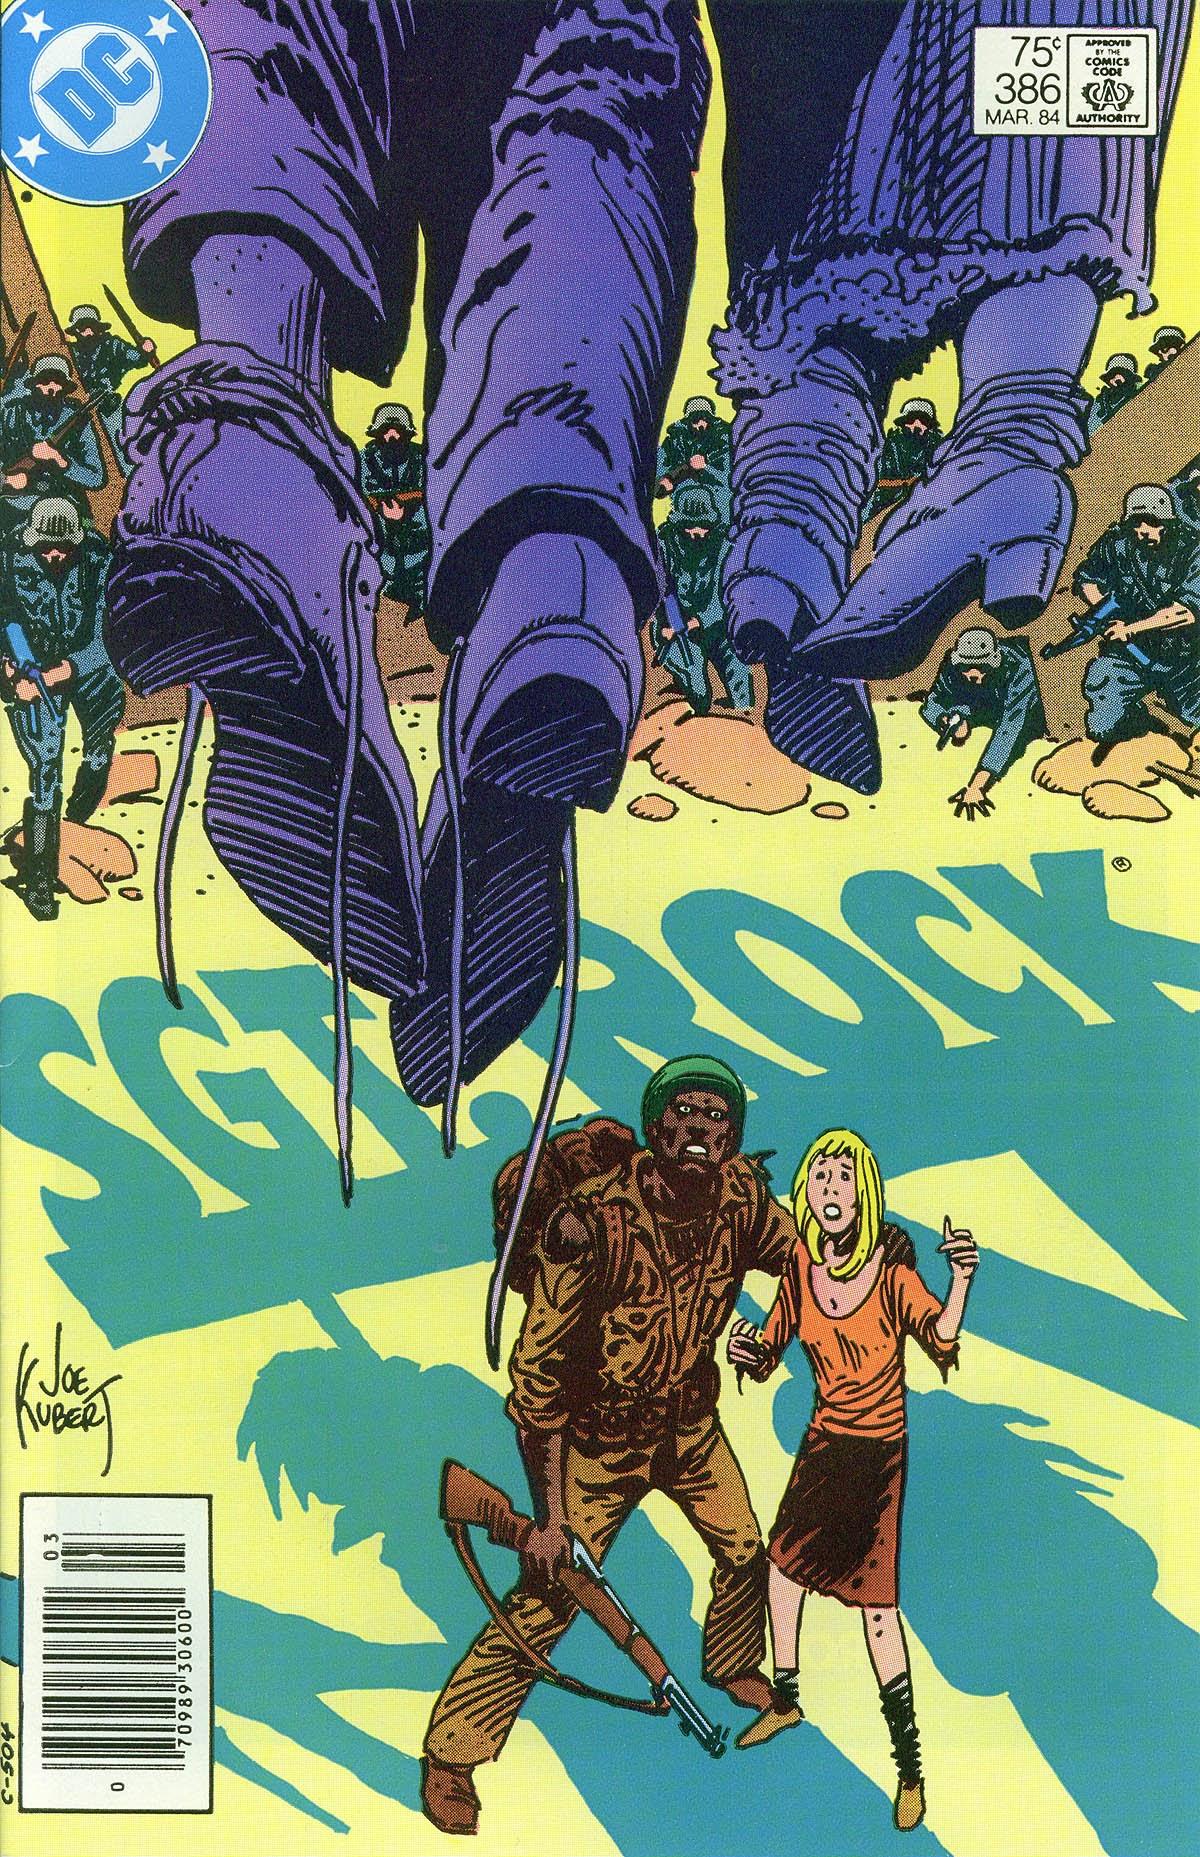 Read online Sgt. Rock comic -  Issue #386 - 1